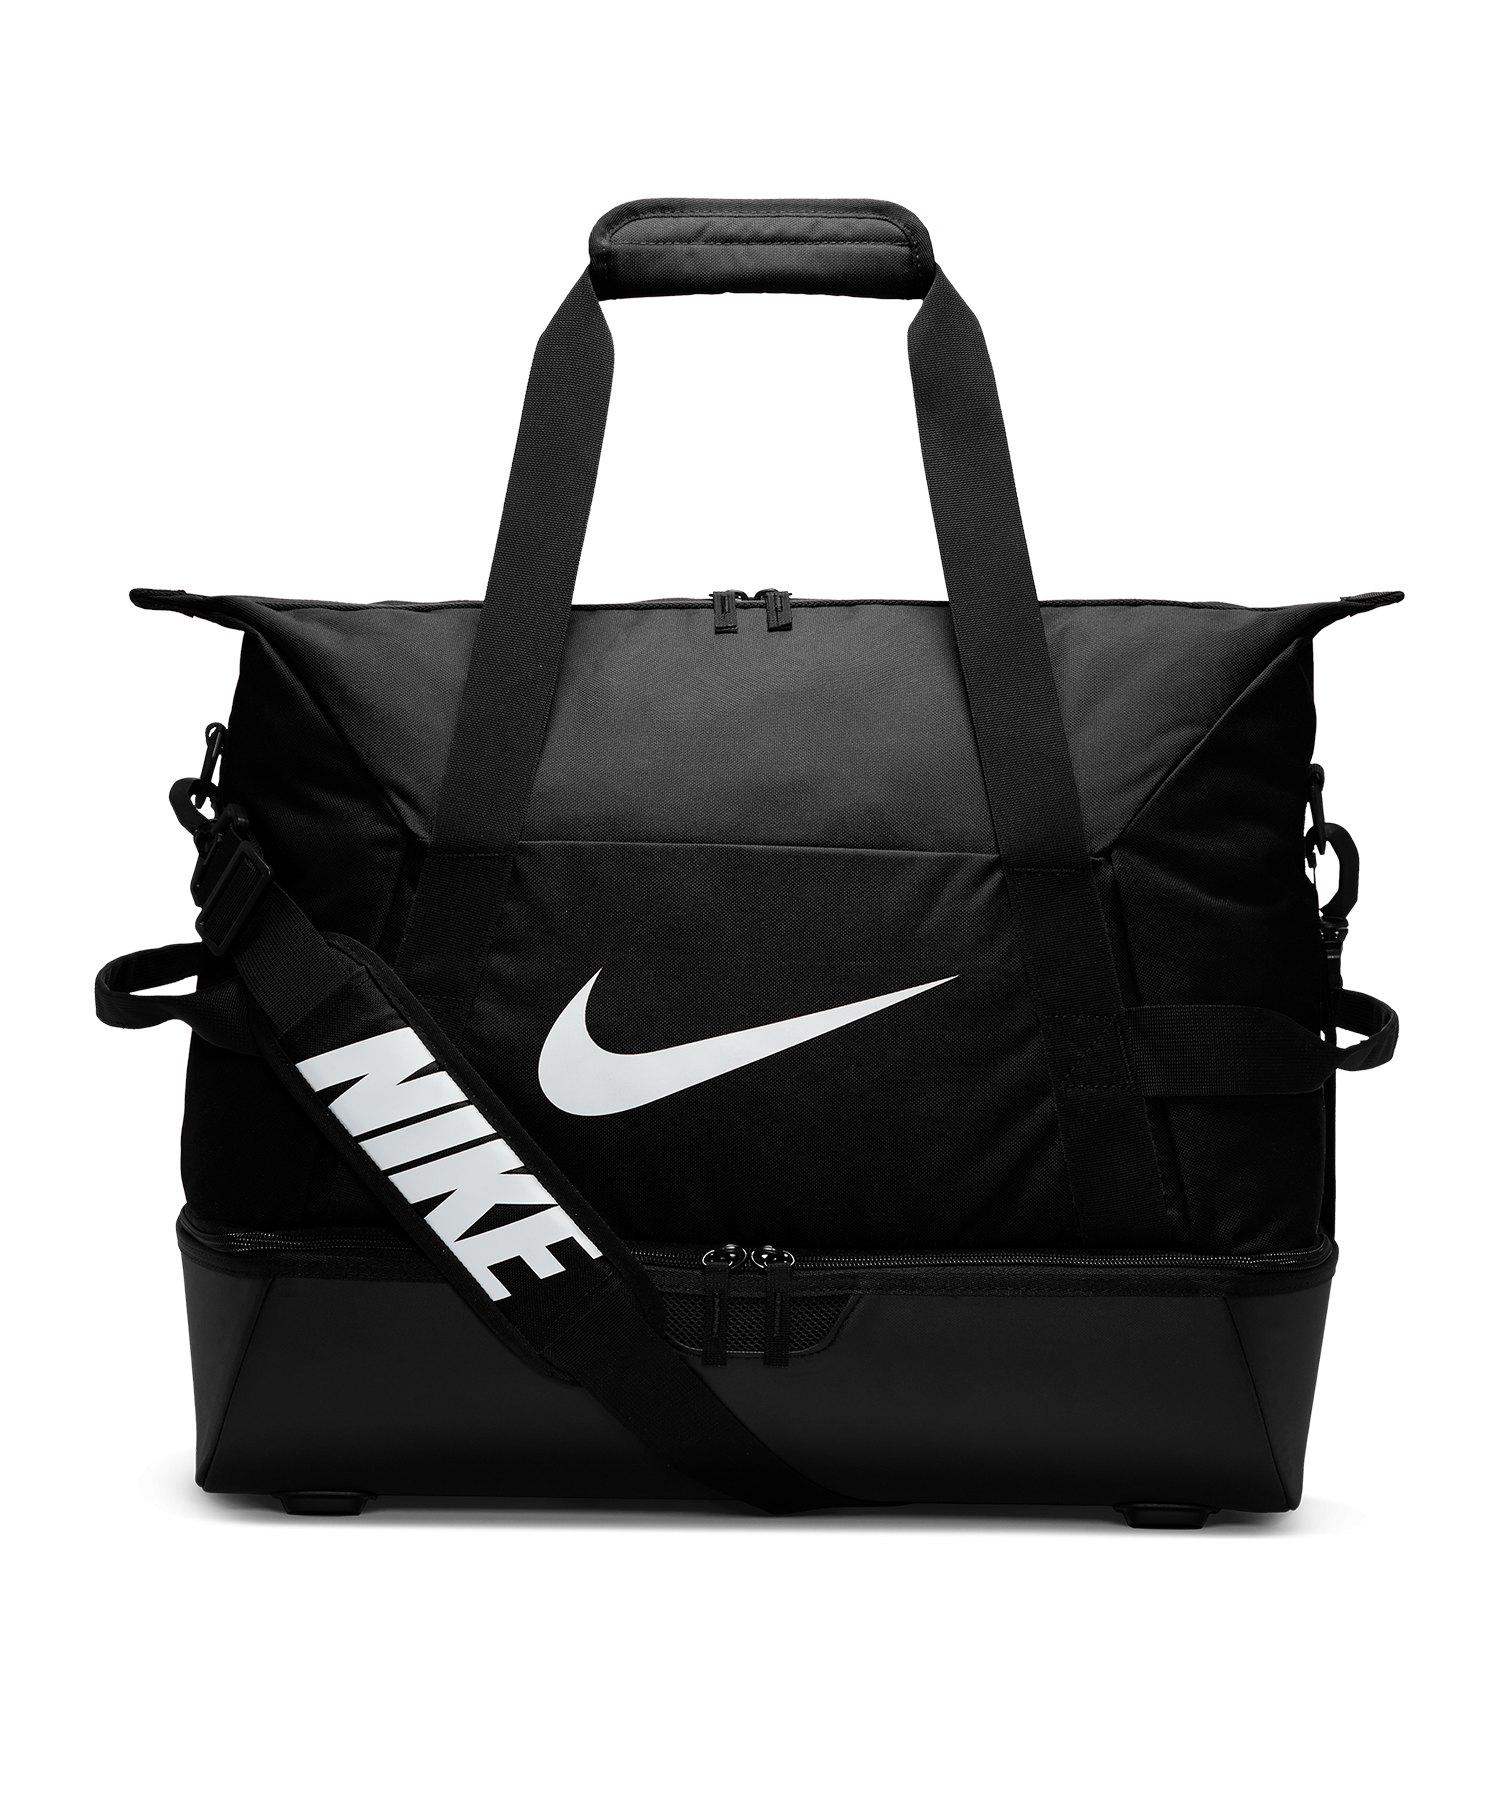 Nike Academy Duffle Tasche Large m.B. F010 - schwarz